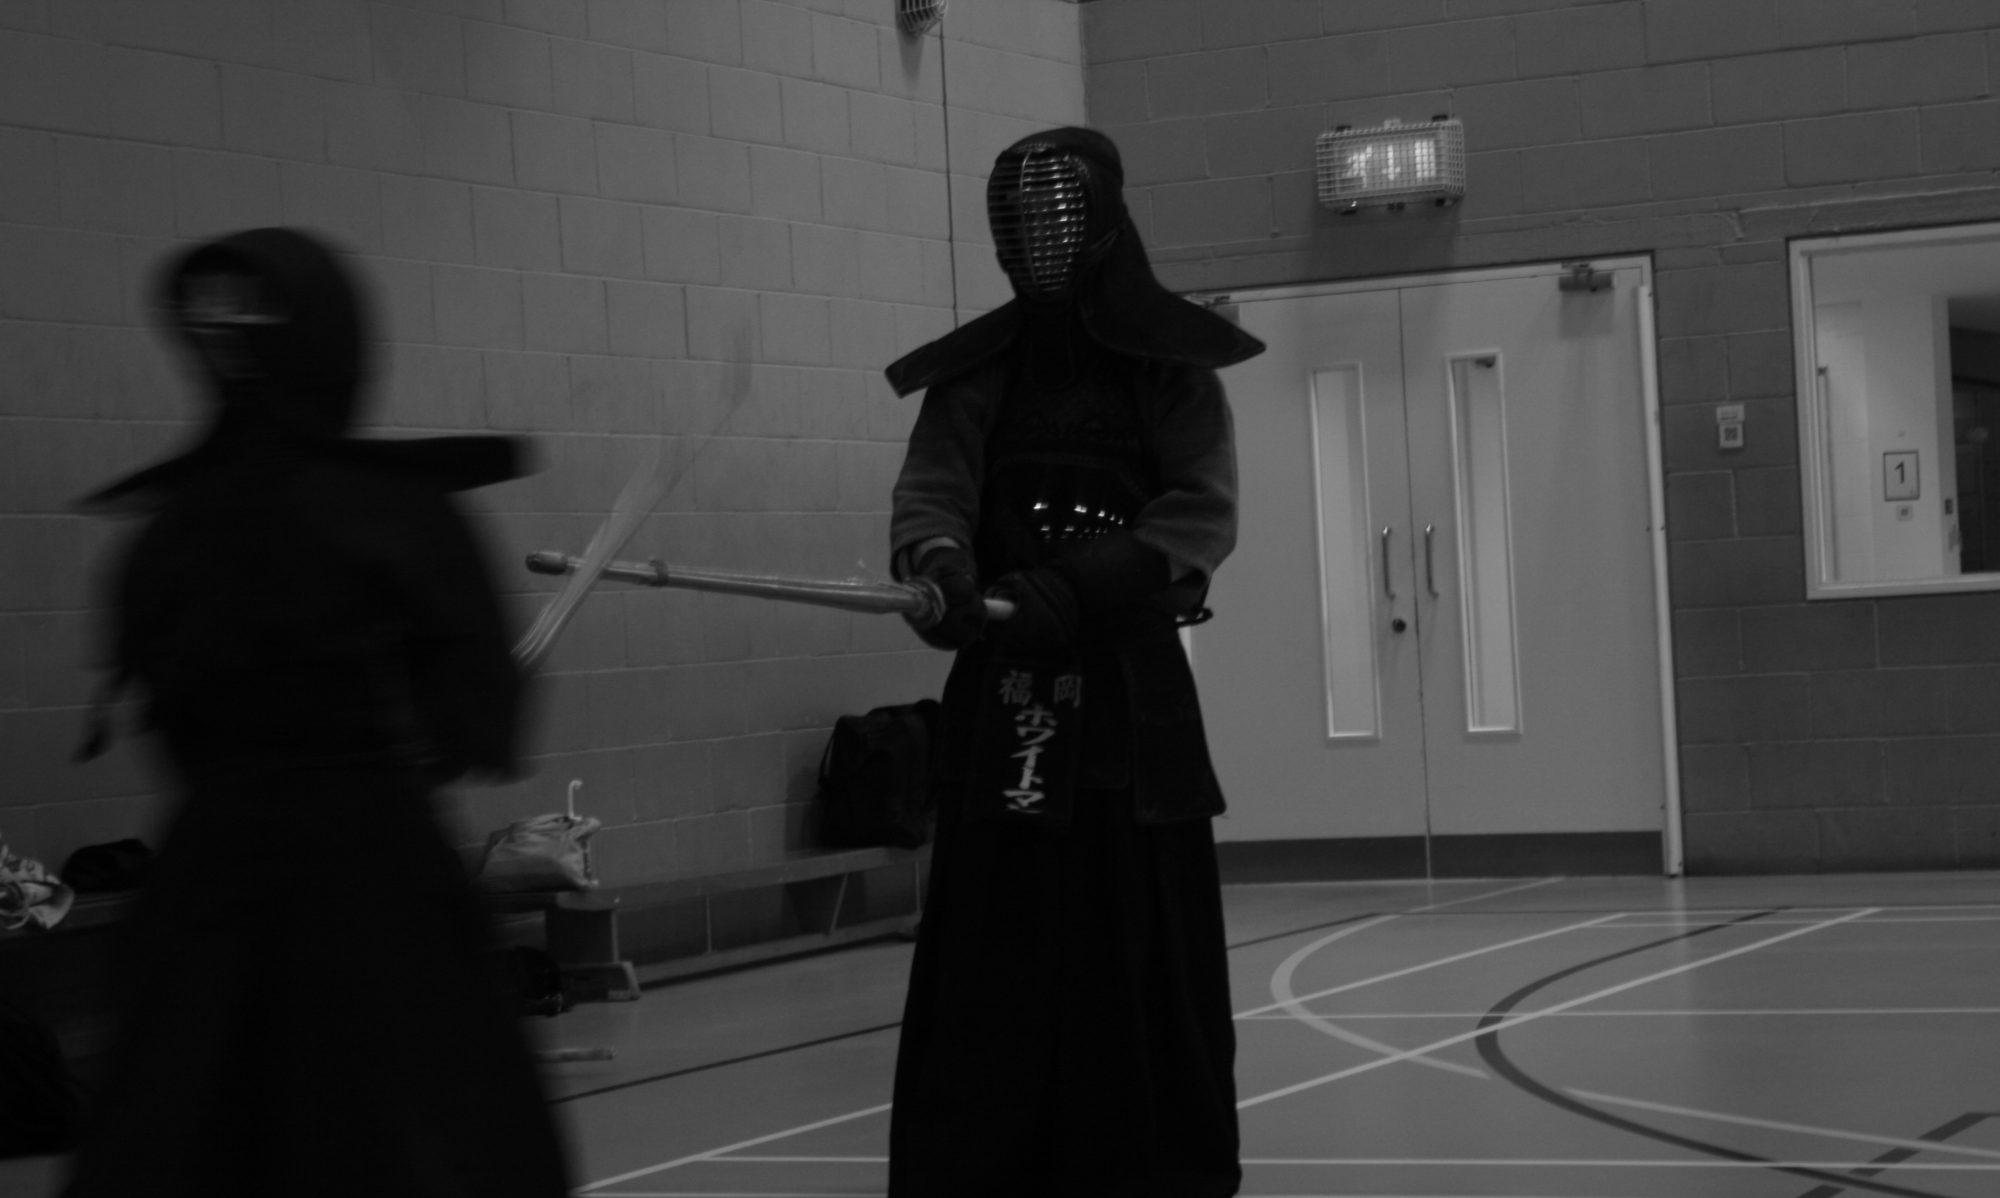 Soushinkan kendo dojo